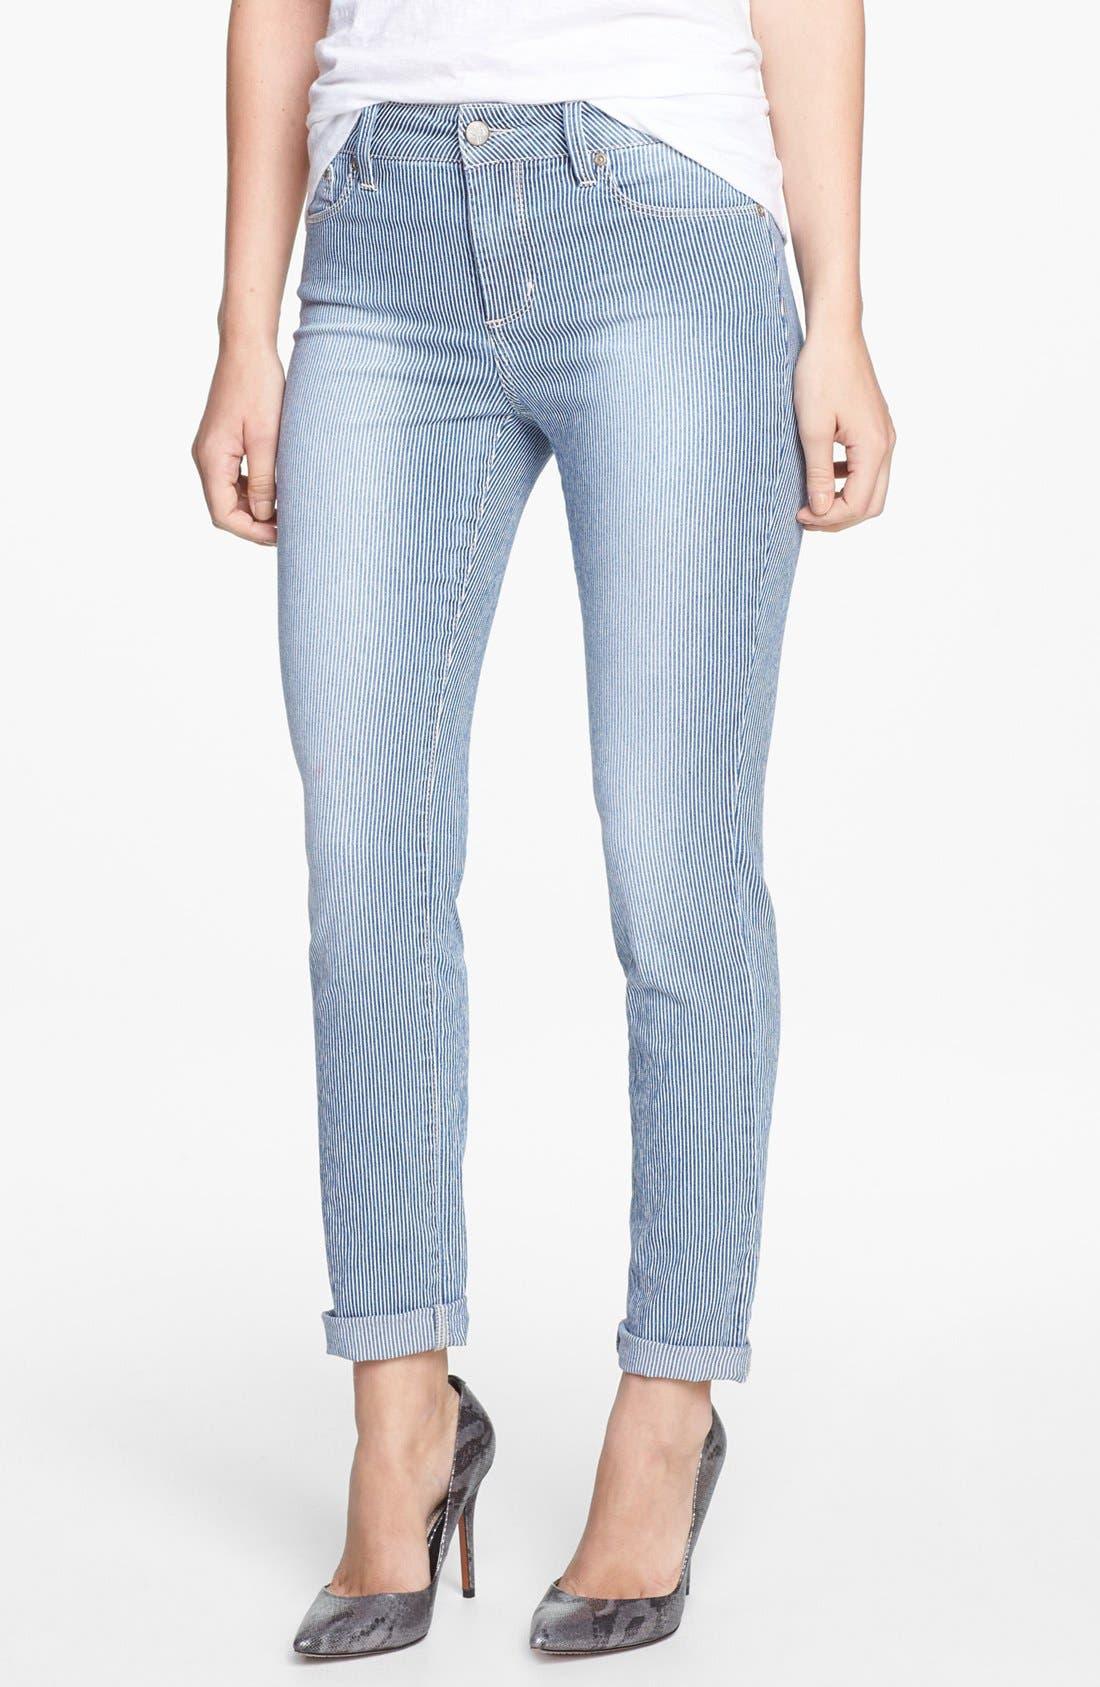 Main Image - NYDJ 'Leann' Stretch Skinny Boyfriend Jeans (Old West Stripe) (Petite)